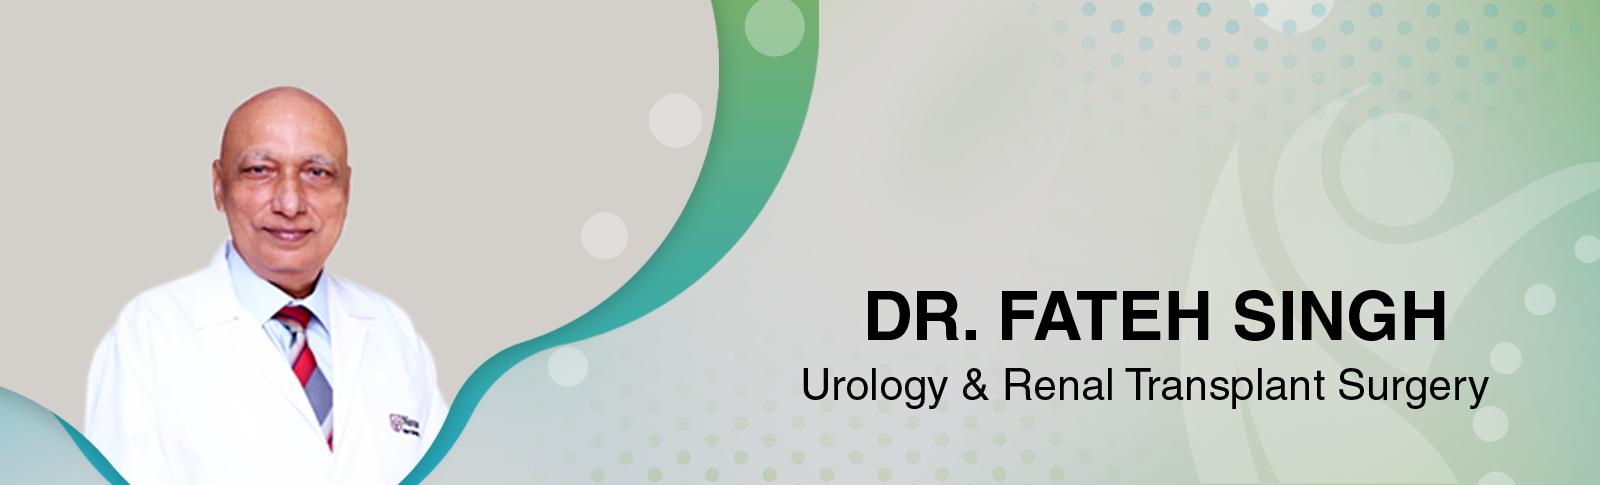 Dr. Fateh Singh